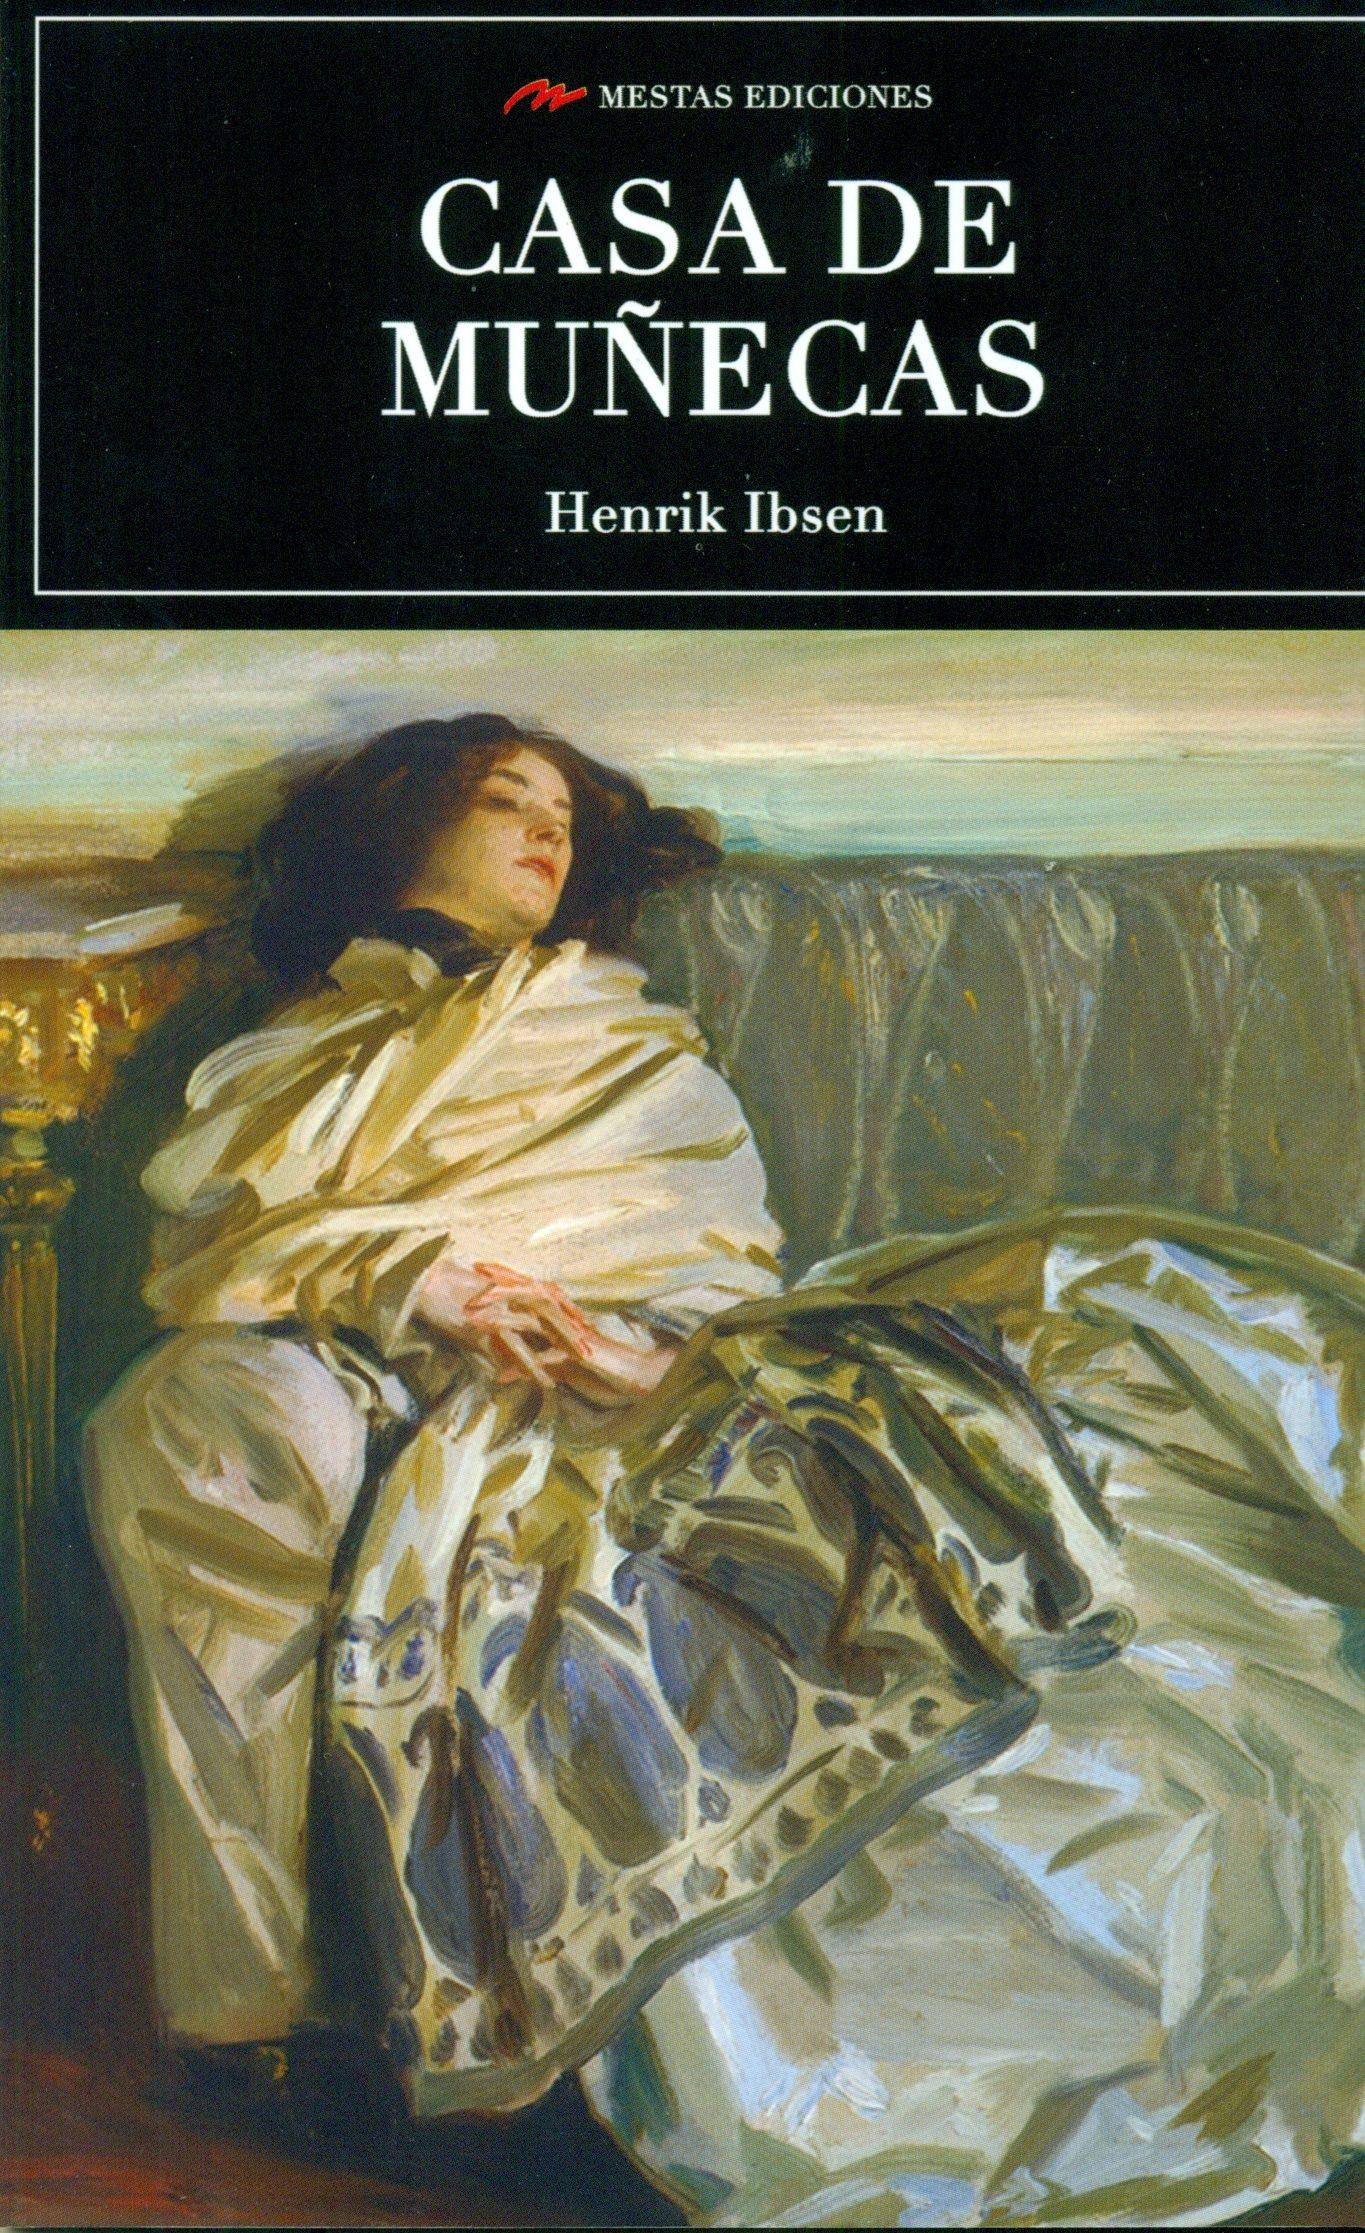 CASA DE MUÑECAS | HENRIK IBSEN | Comprar libro 9788416775101